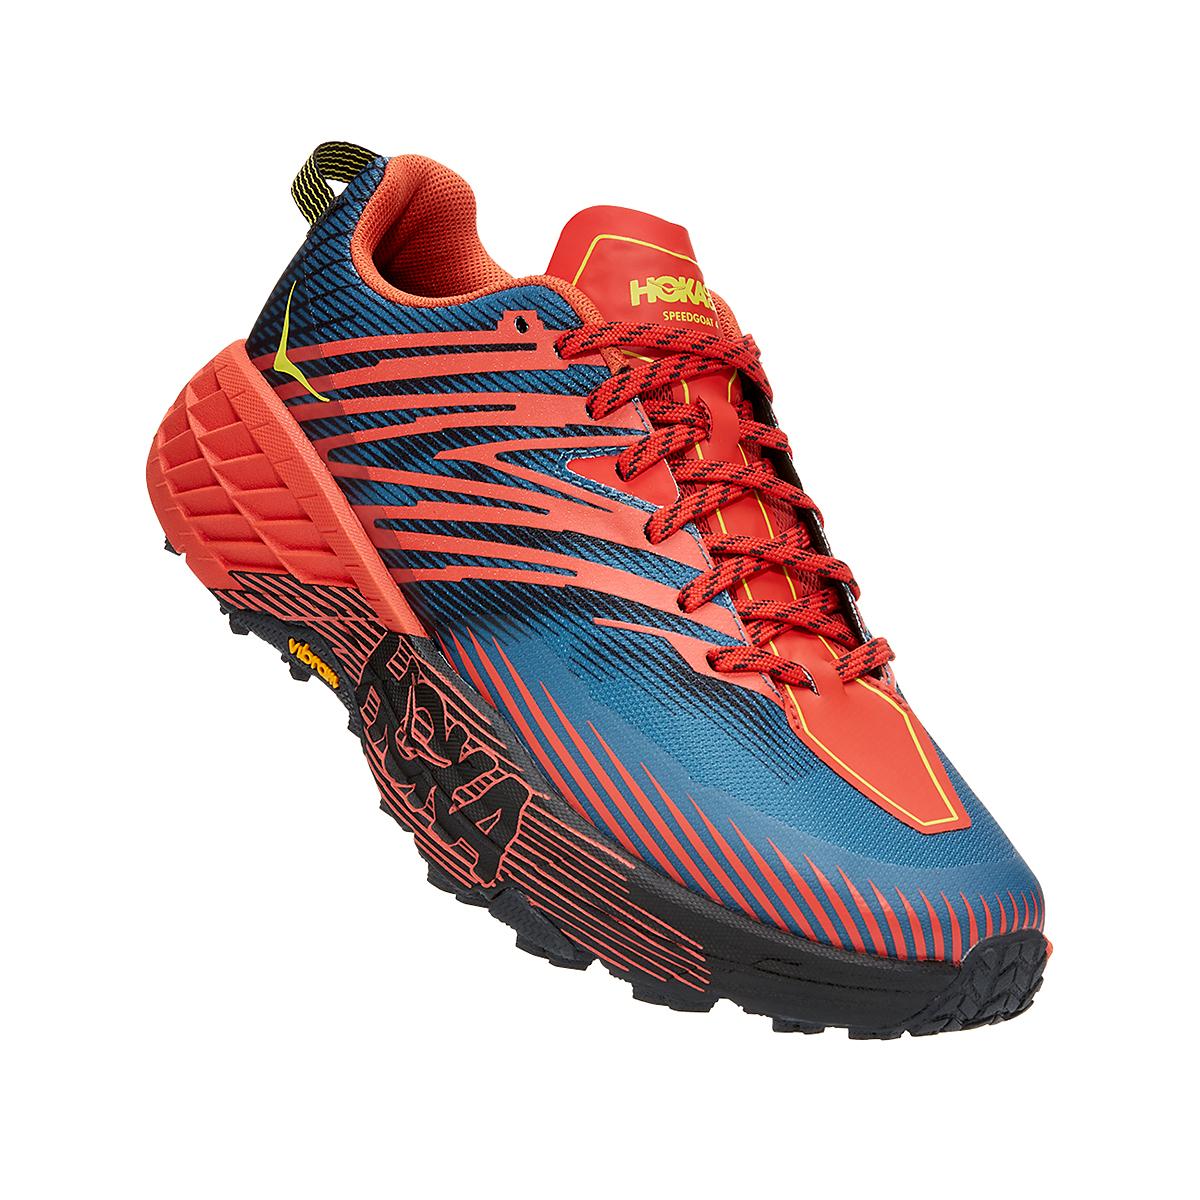 Men's Hoka One One Speedgoat 4 Trail Running Shoe, , large, image 3